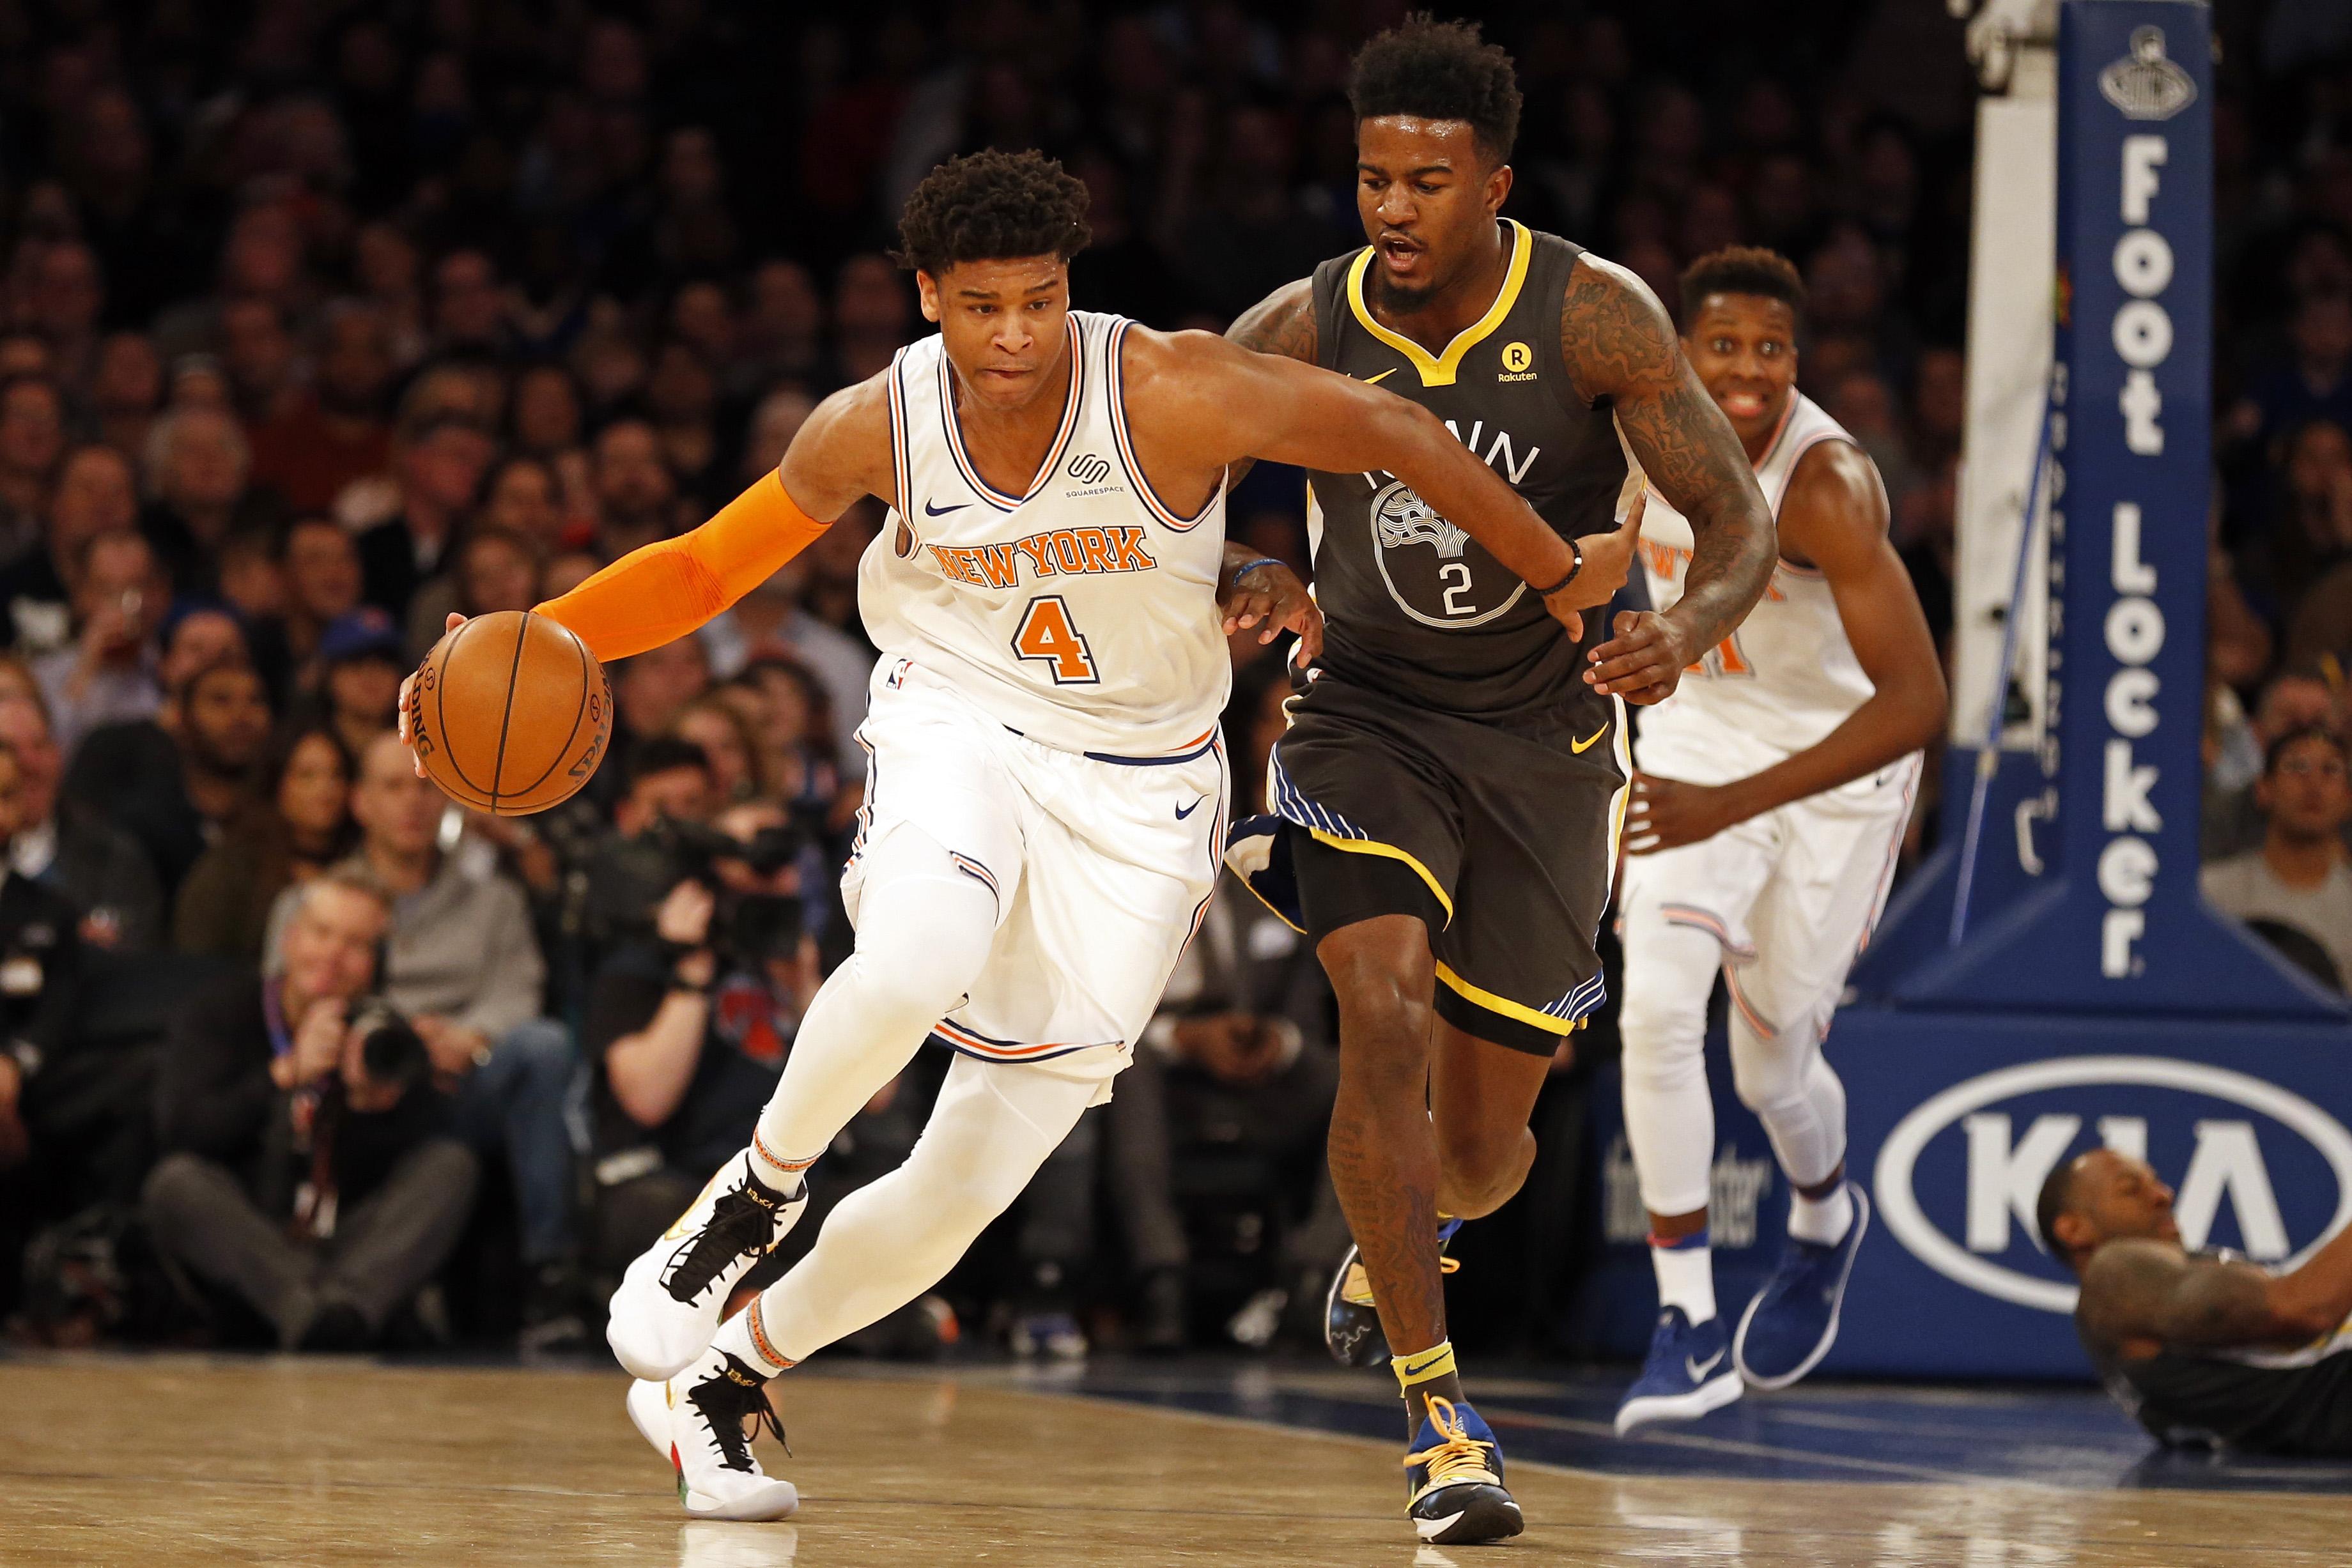 Isaiah Hicks' Big Night Helps Westchester Knicks Clinch Postseason Berth